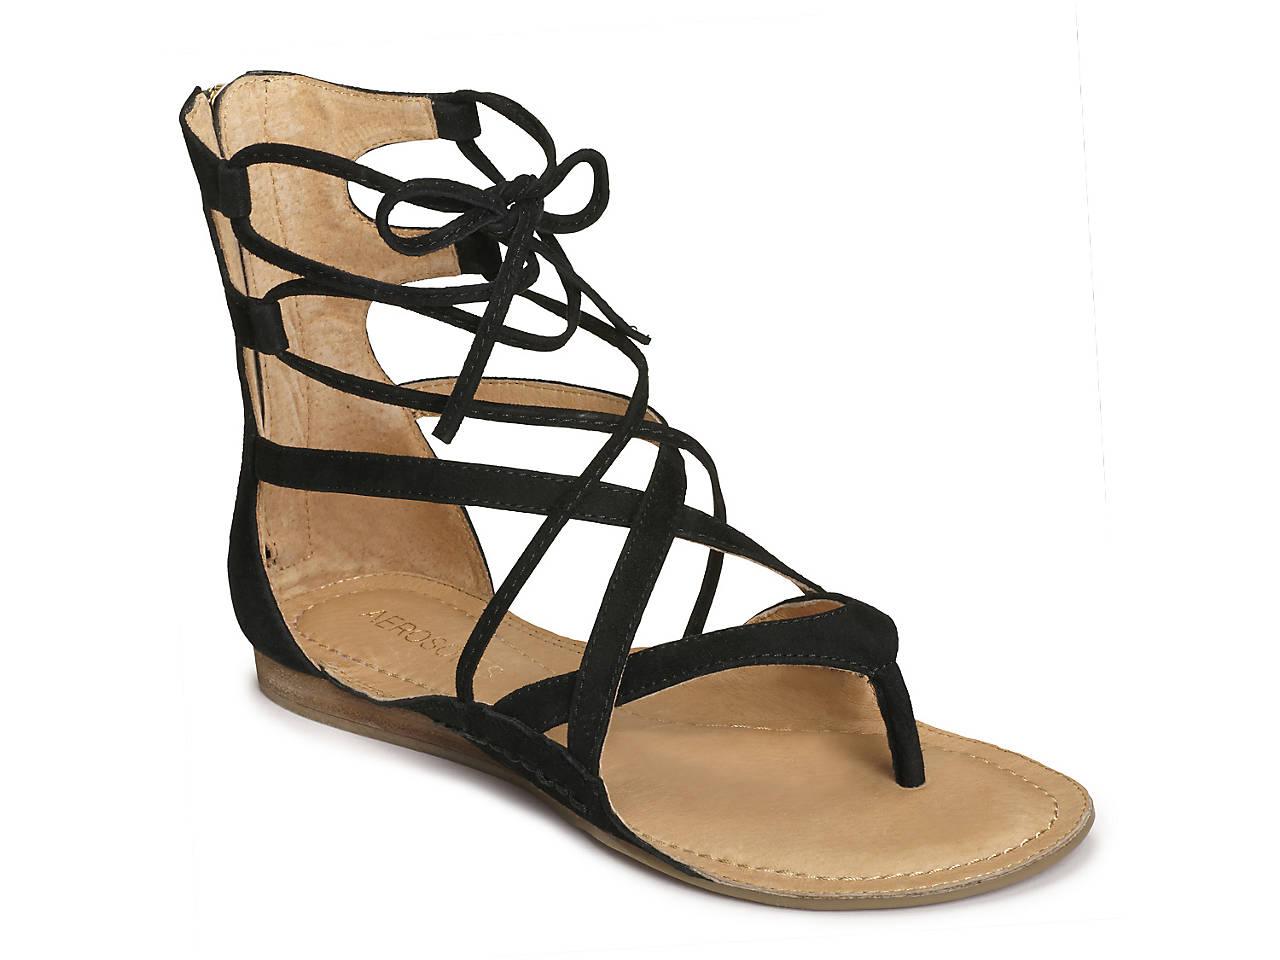 31f4ccb8e15a Aerosoles Scrapbook Gladiator Sandal Women s Shoes